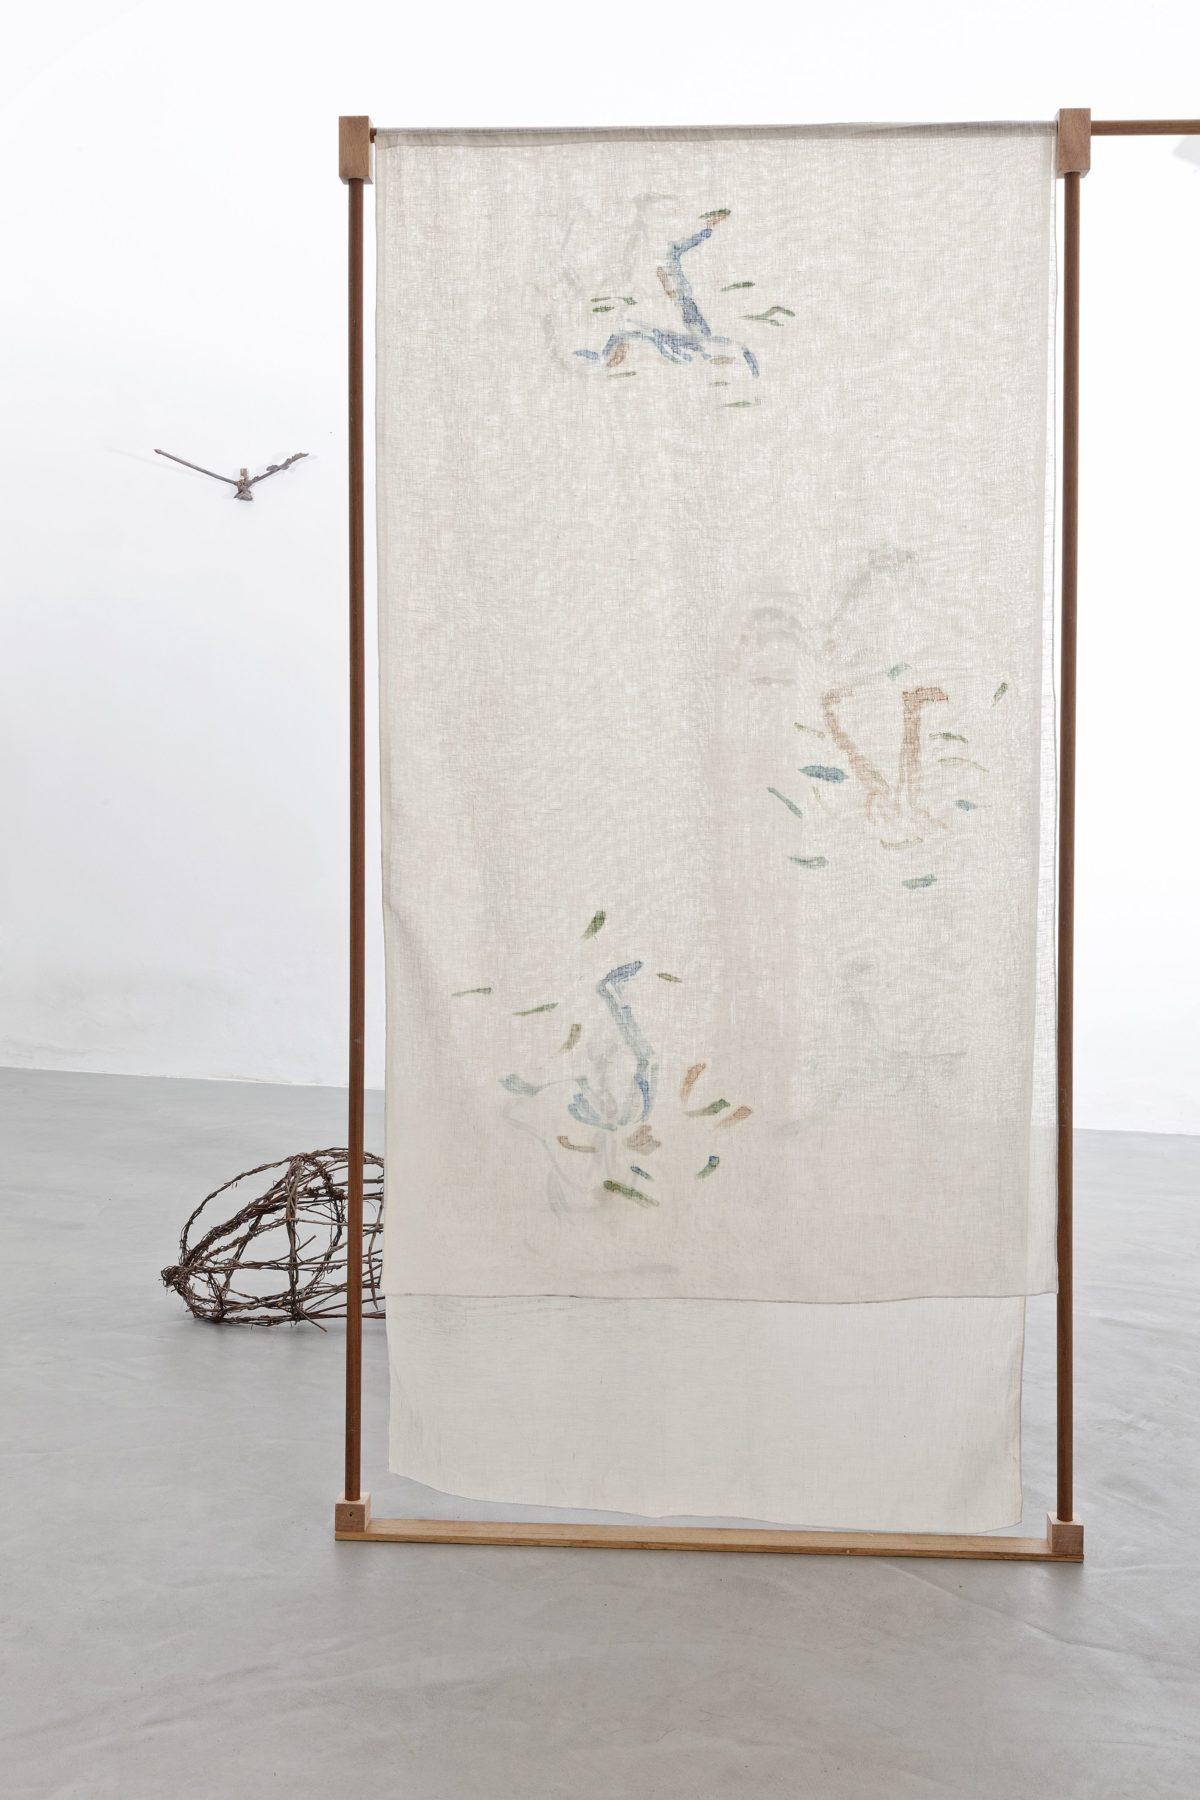 Beatrice Meoni, Failing Falling Failing, 2018, separé, lino dipinto e legno, cm 240x90